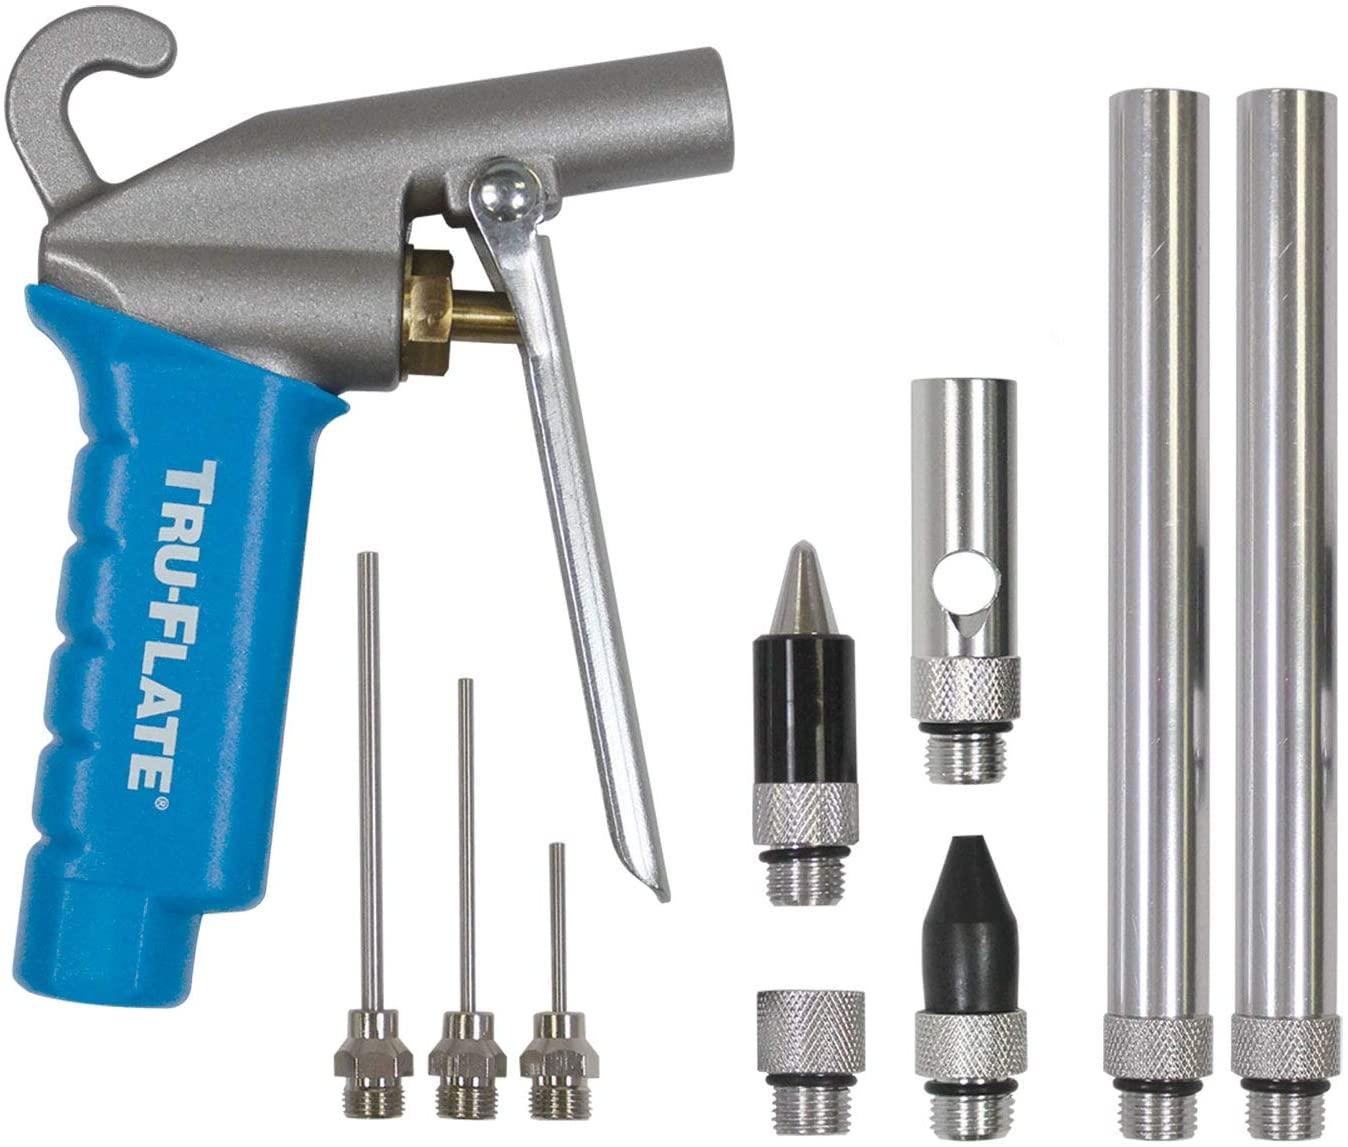 Plews & Edelmann Tru-Flate 18-613 F1 Series 40 CFM HI FLO Blowgun Kit, 10 Piece,